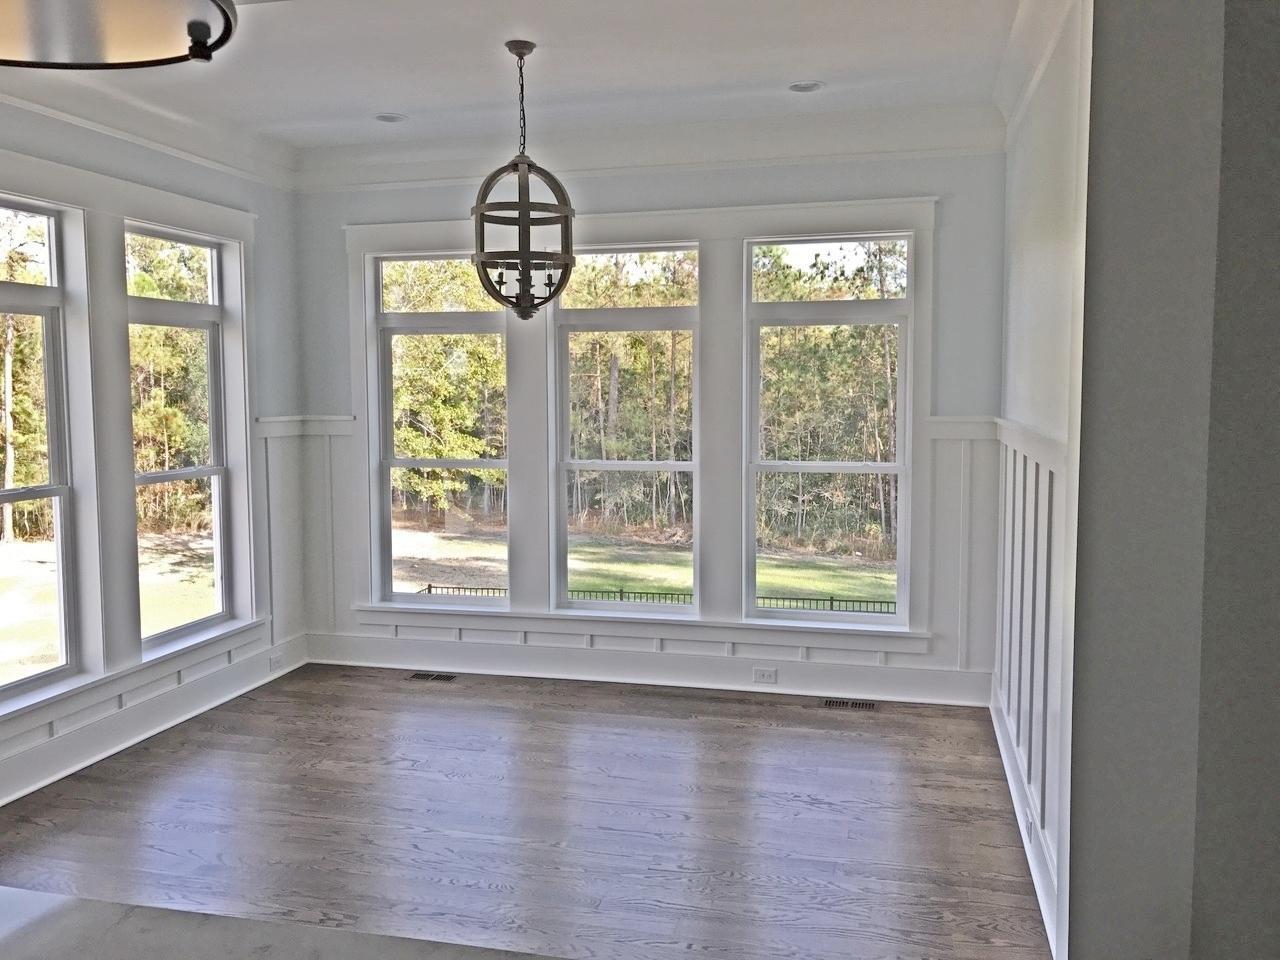 Kiawah River Estates Homes For Sale - 2862 Maritime Forest, Johns Island, SC - 7